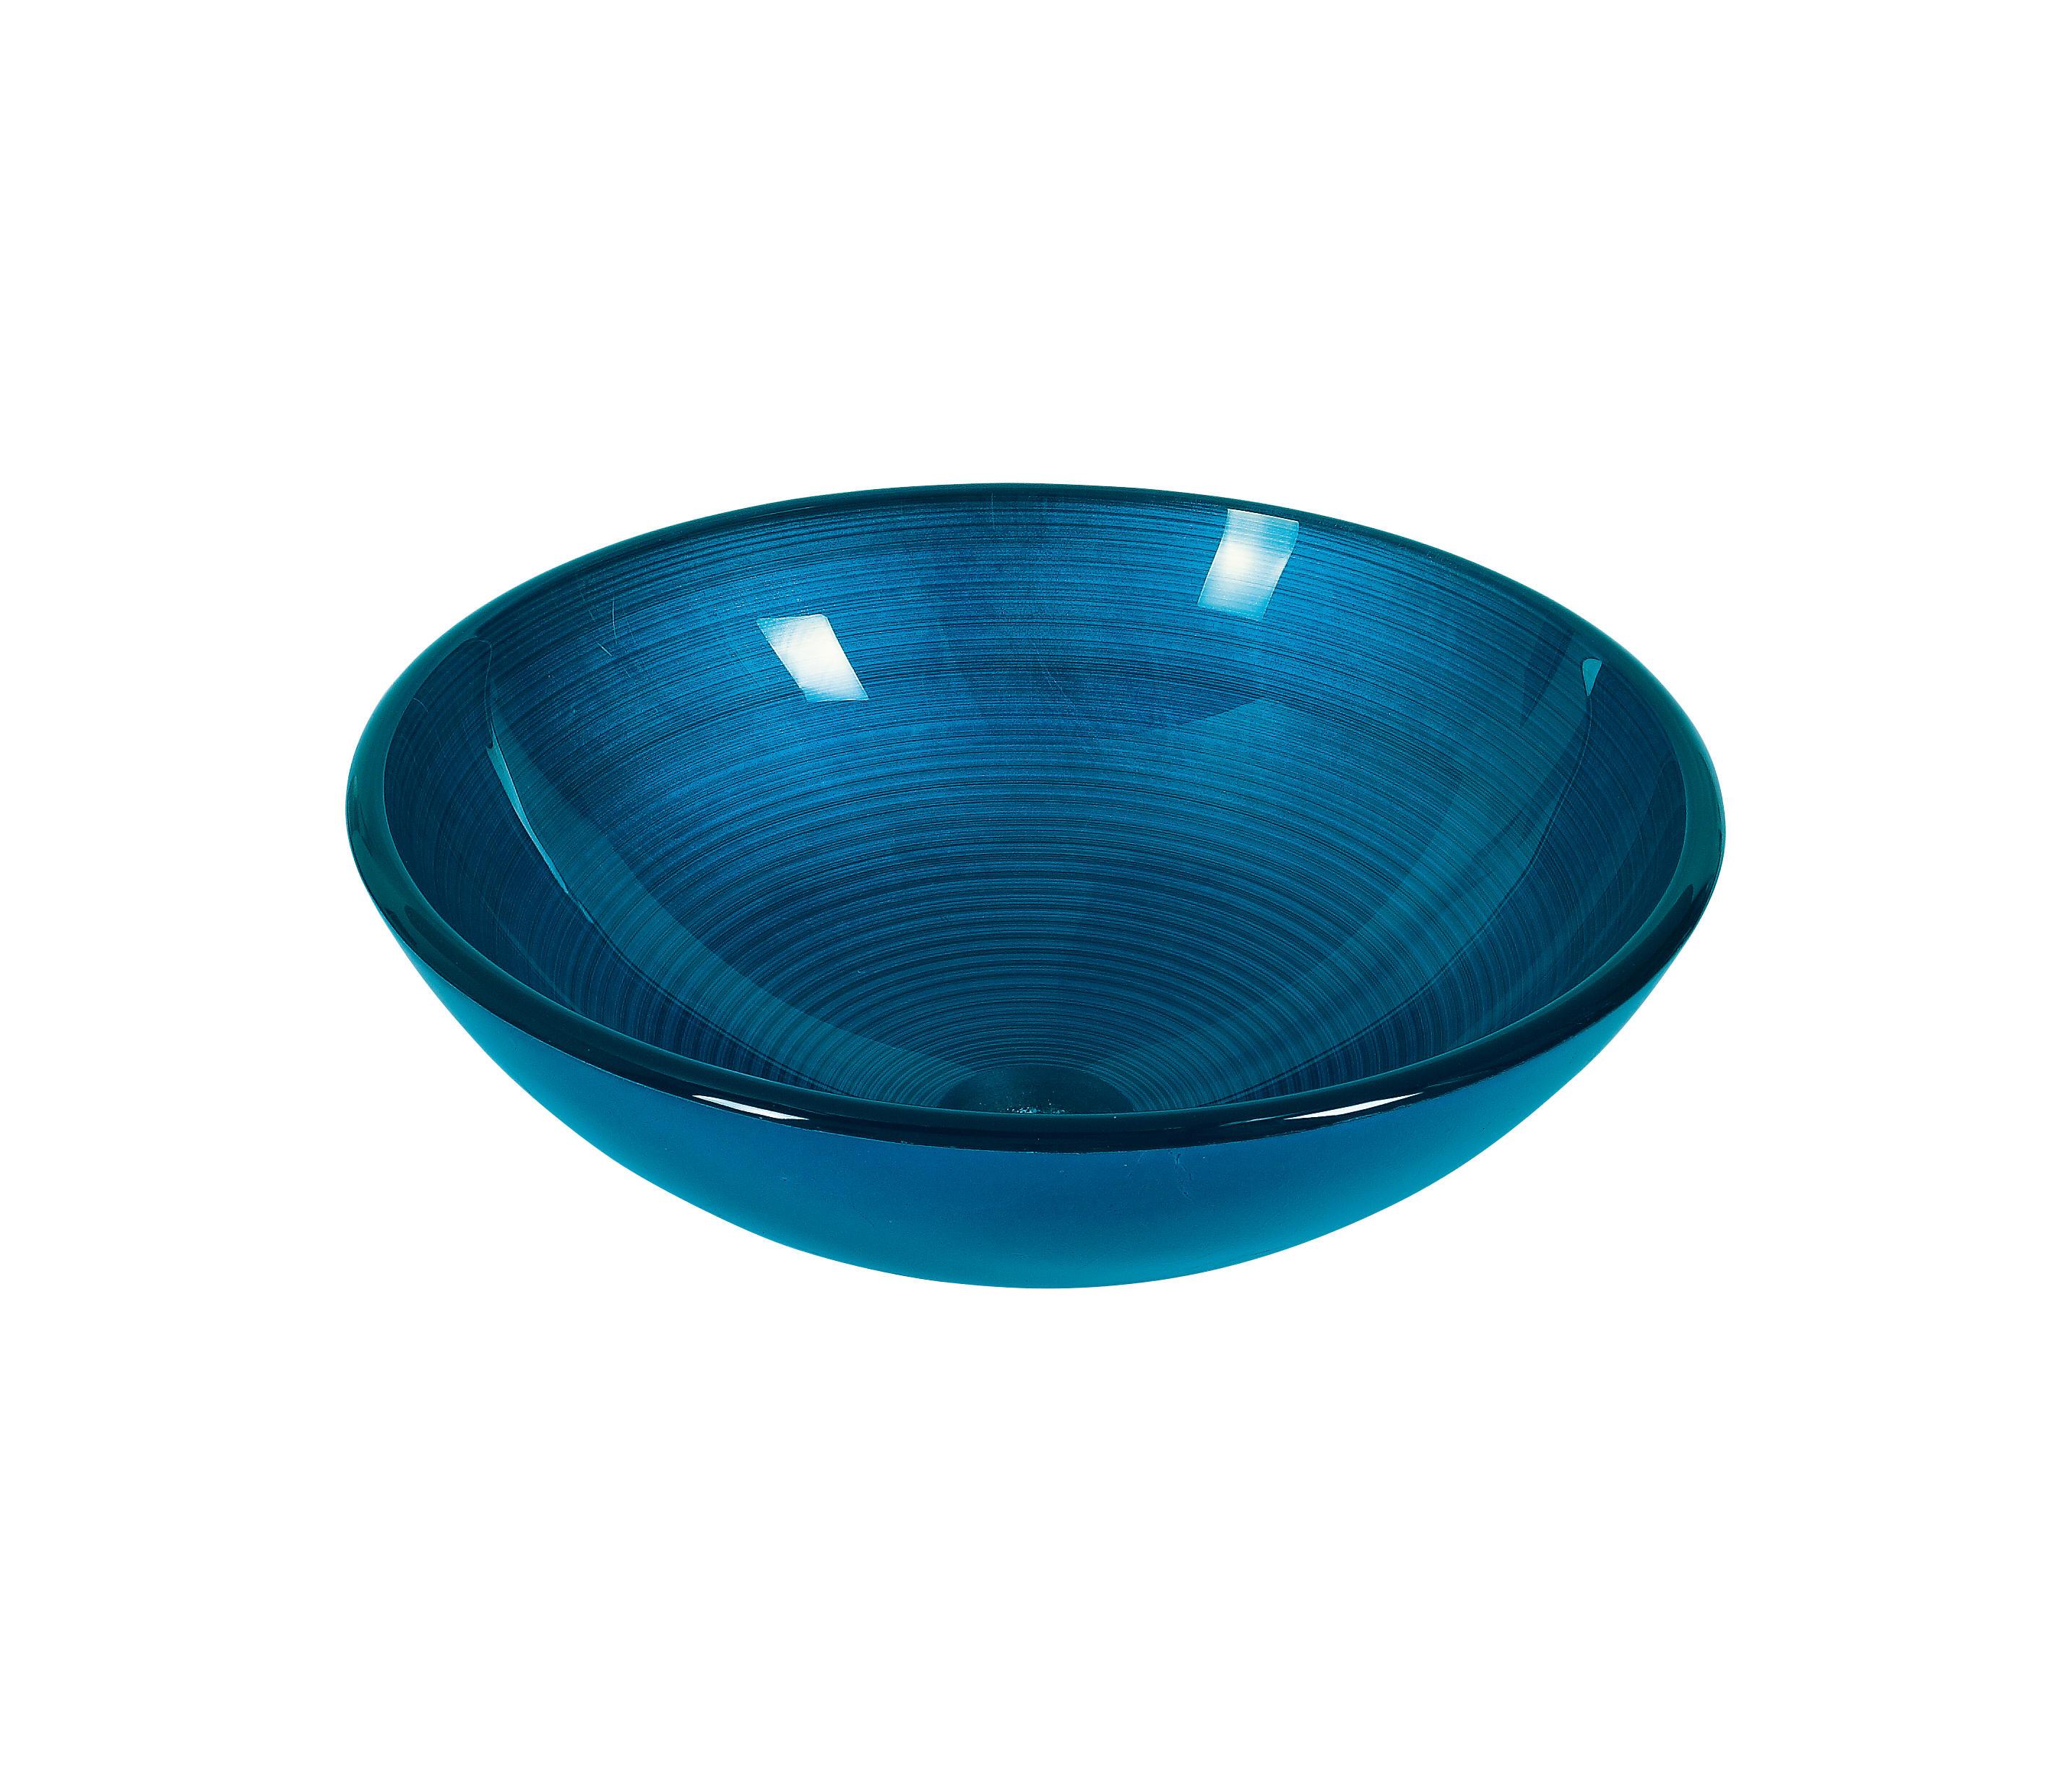 lavabo agadir blue wash basins from dune cerà mica architonic